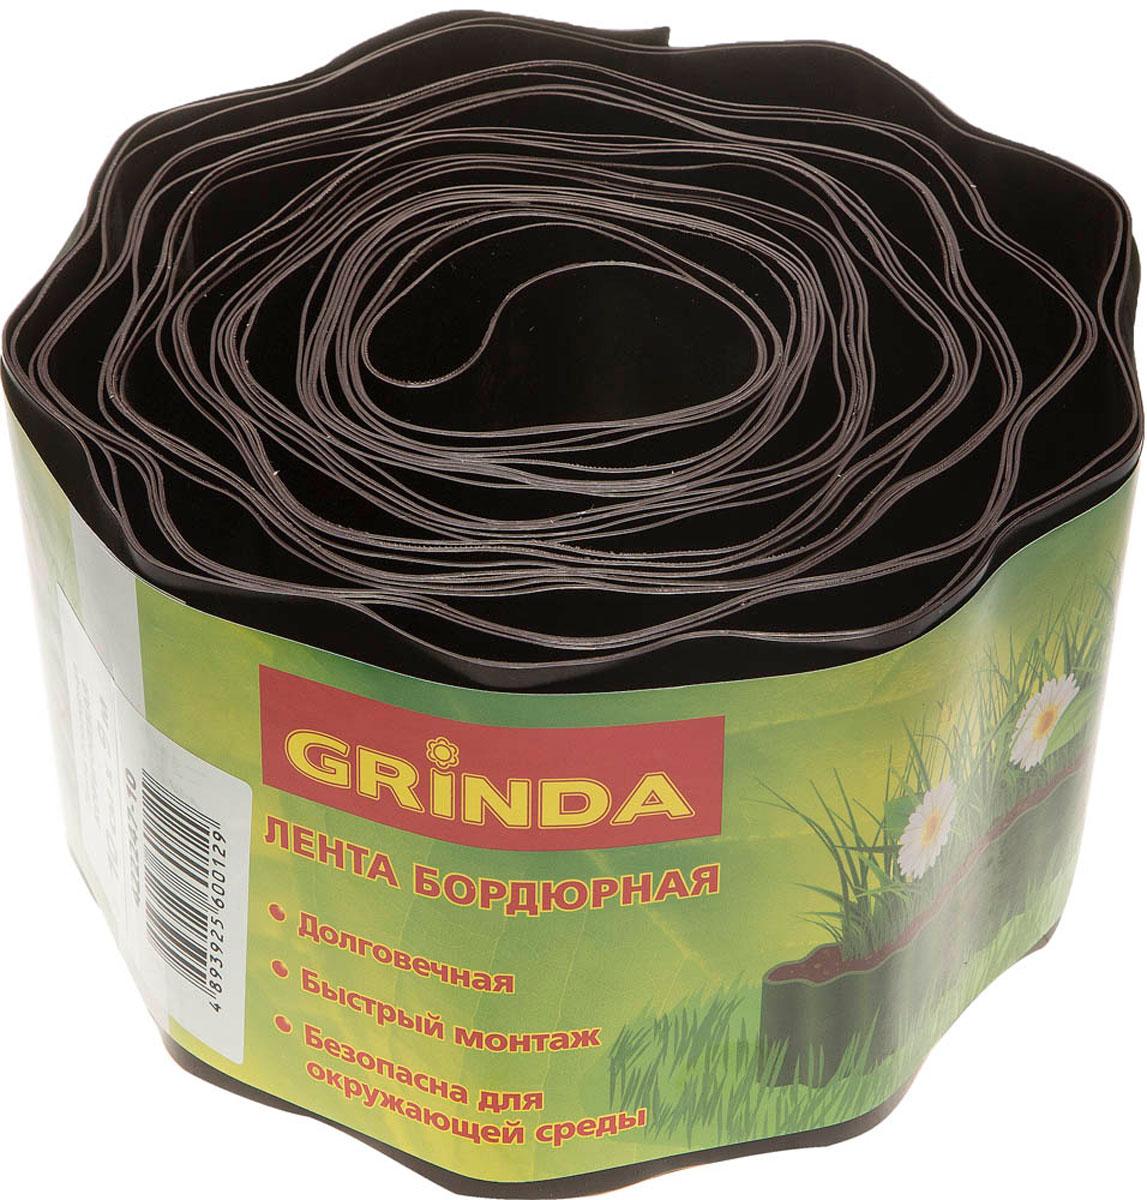 цена на Лента бордюрная Grinda, цвет: коричневый, 10 см х 9 м